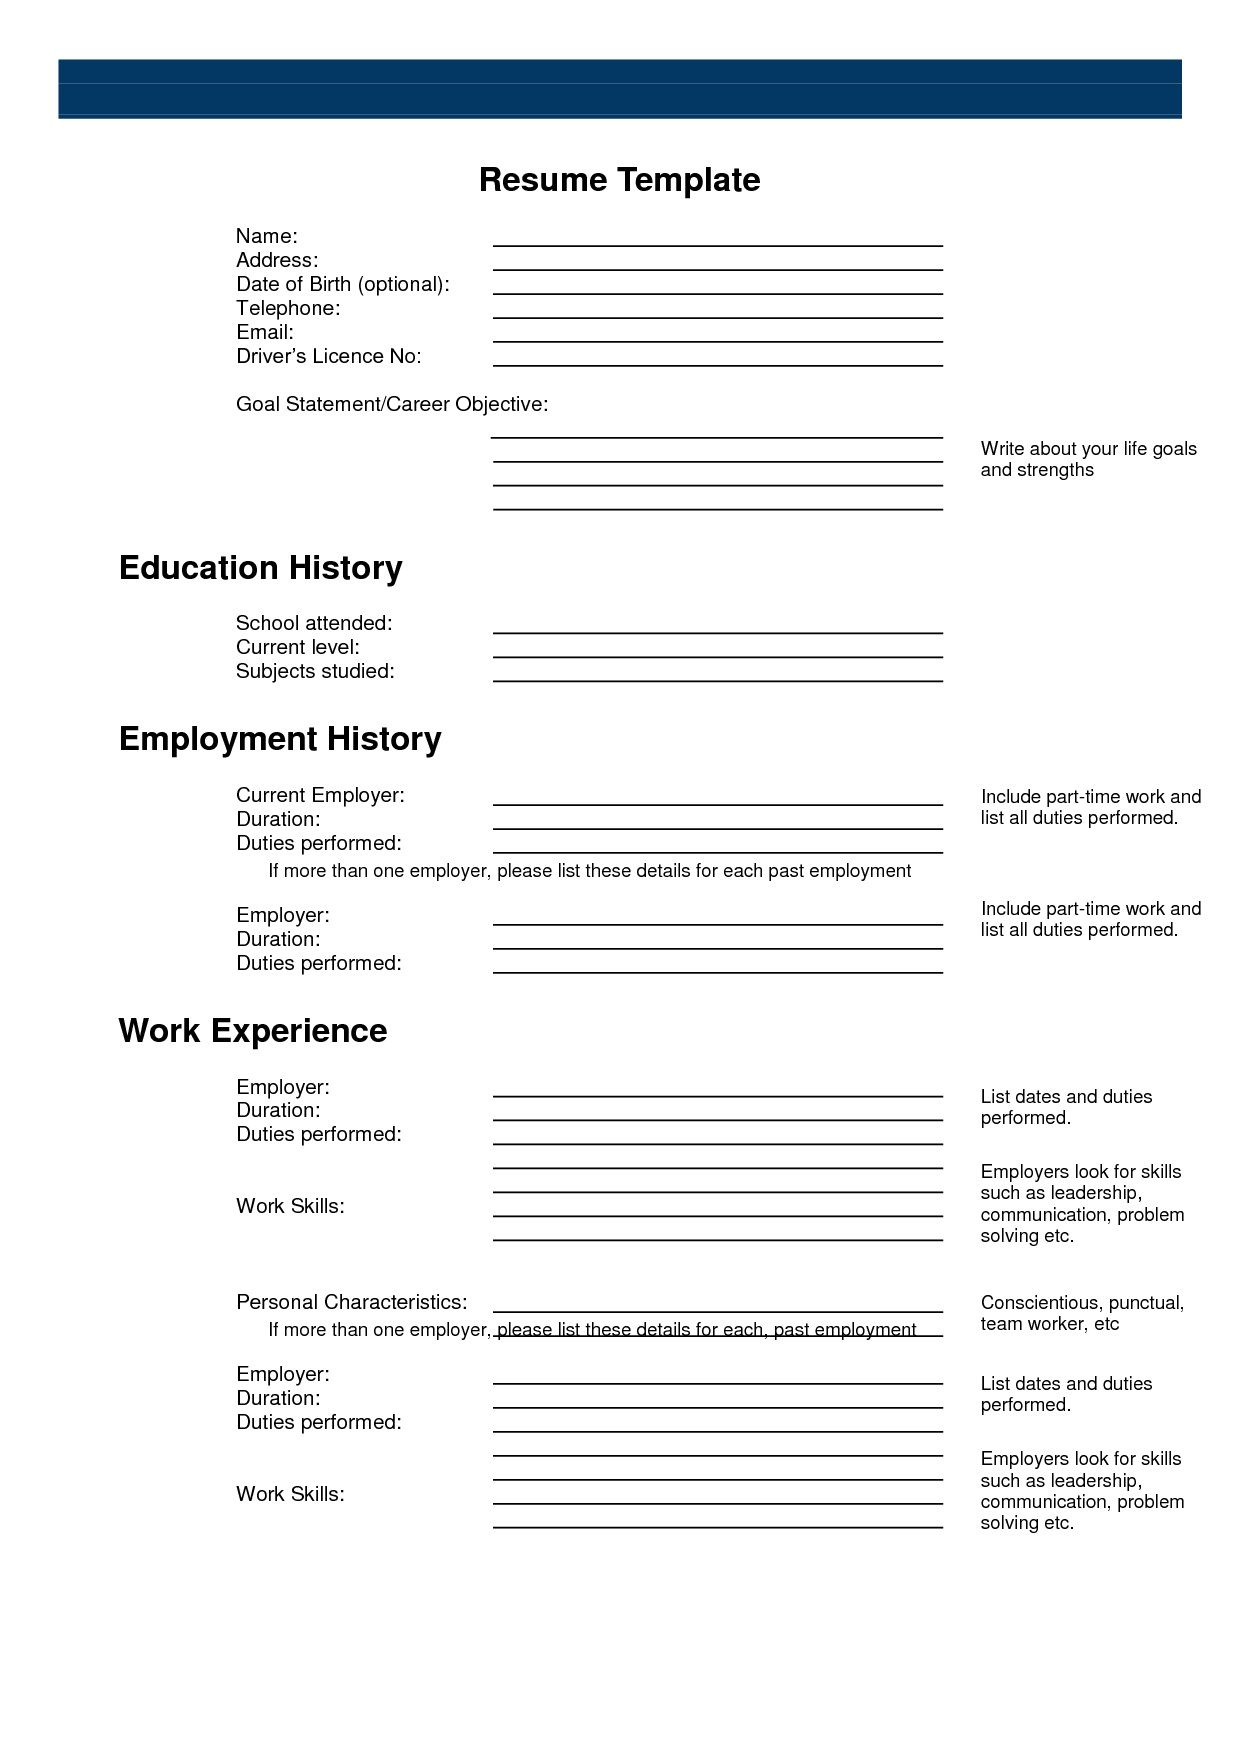 Printable Free printable resume templates, Free